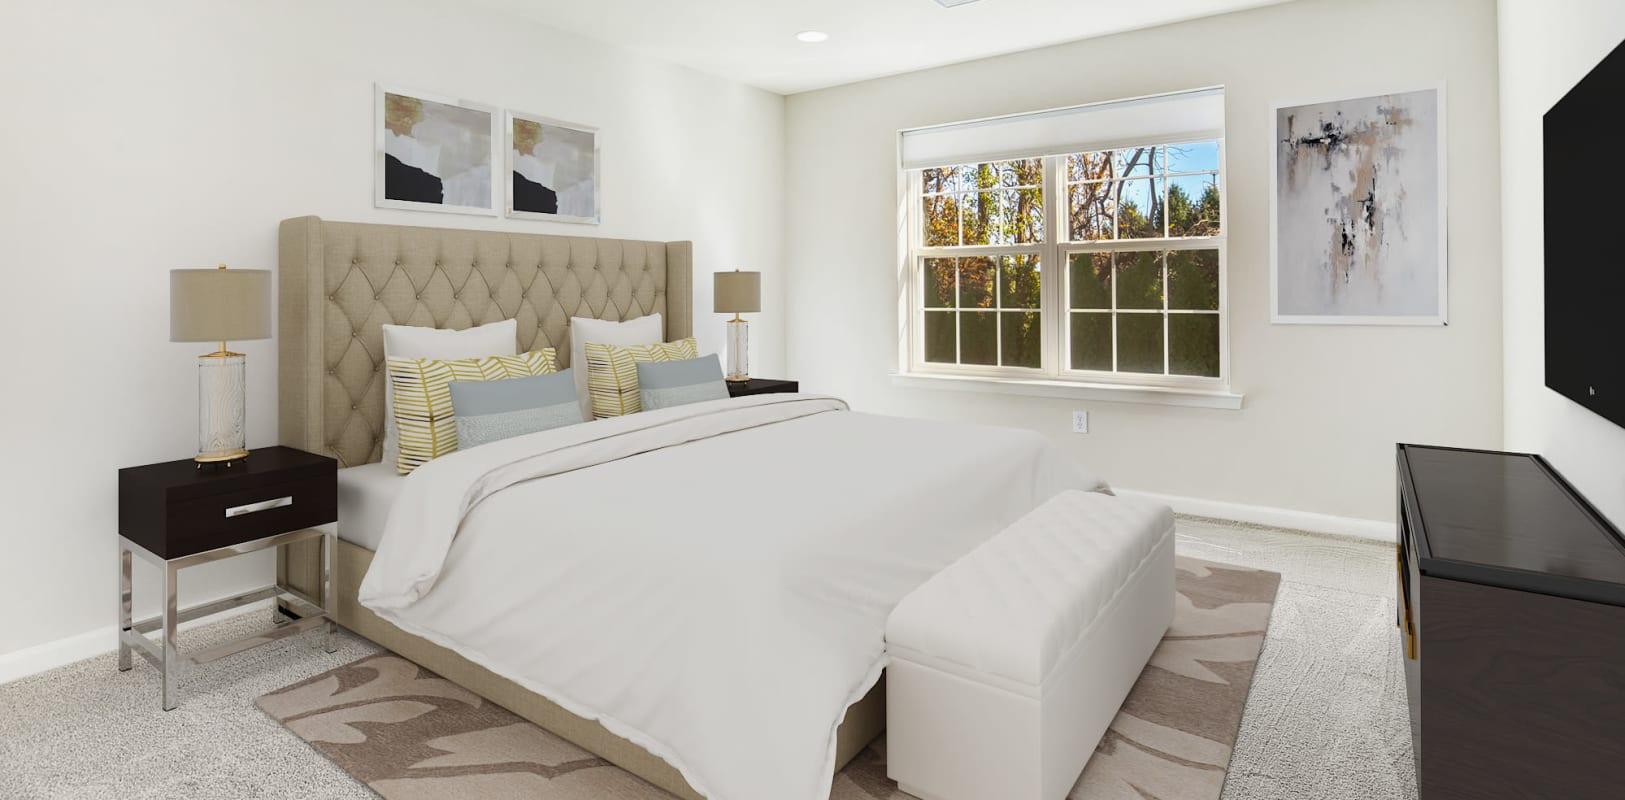 Comfortable bedroom with plush carpeting at Hanover Glen in Bethlehem, Pennsylvania